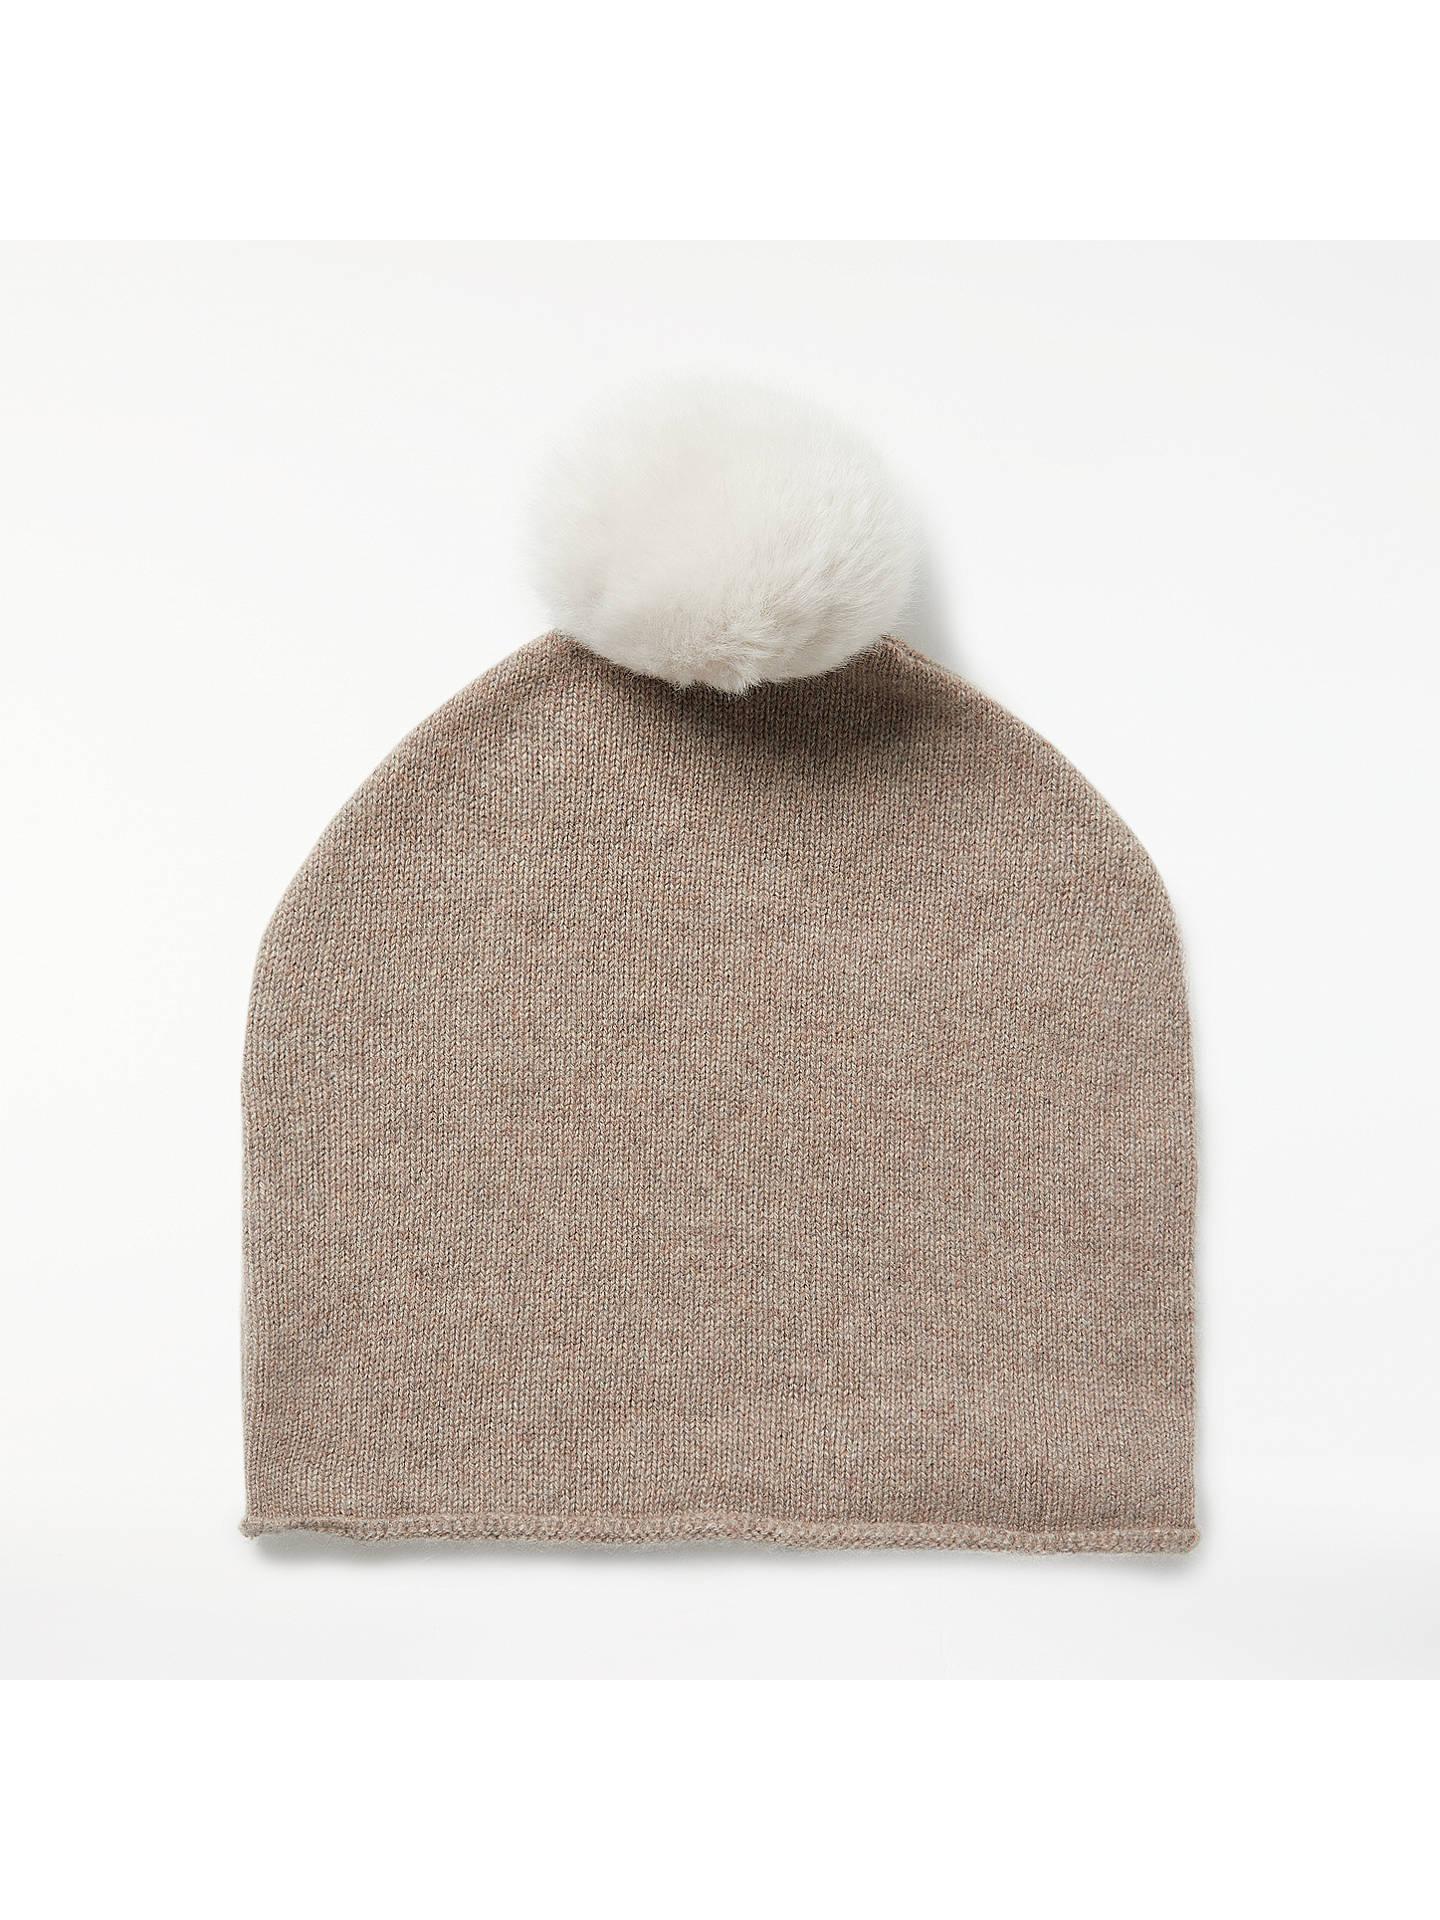 1baa88c60f4dc John Lewis   Partners Cashmere Bobble Beanie Hat at John Lewis ...